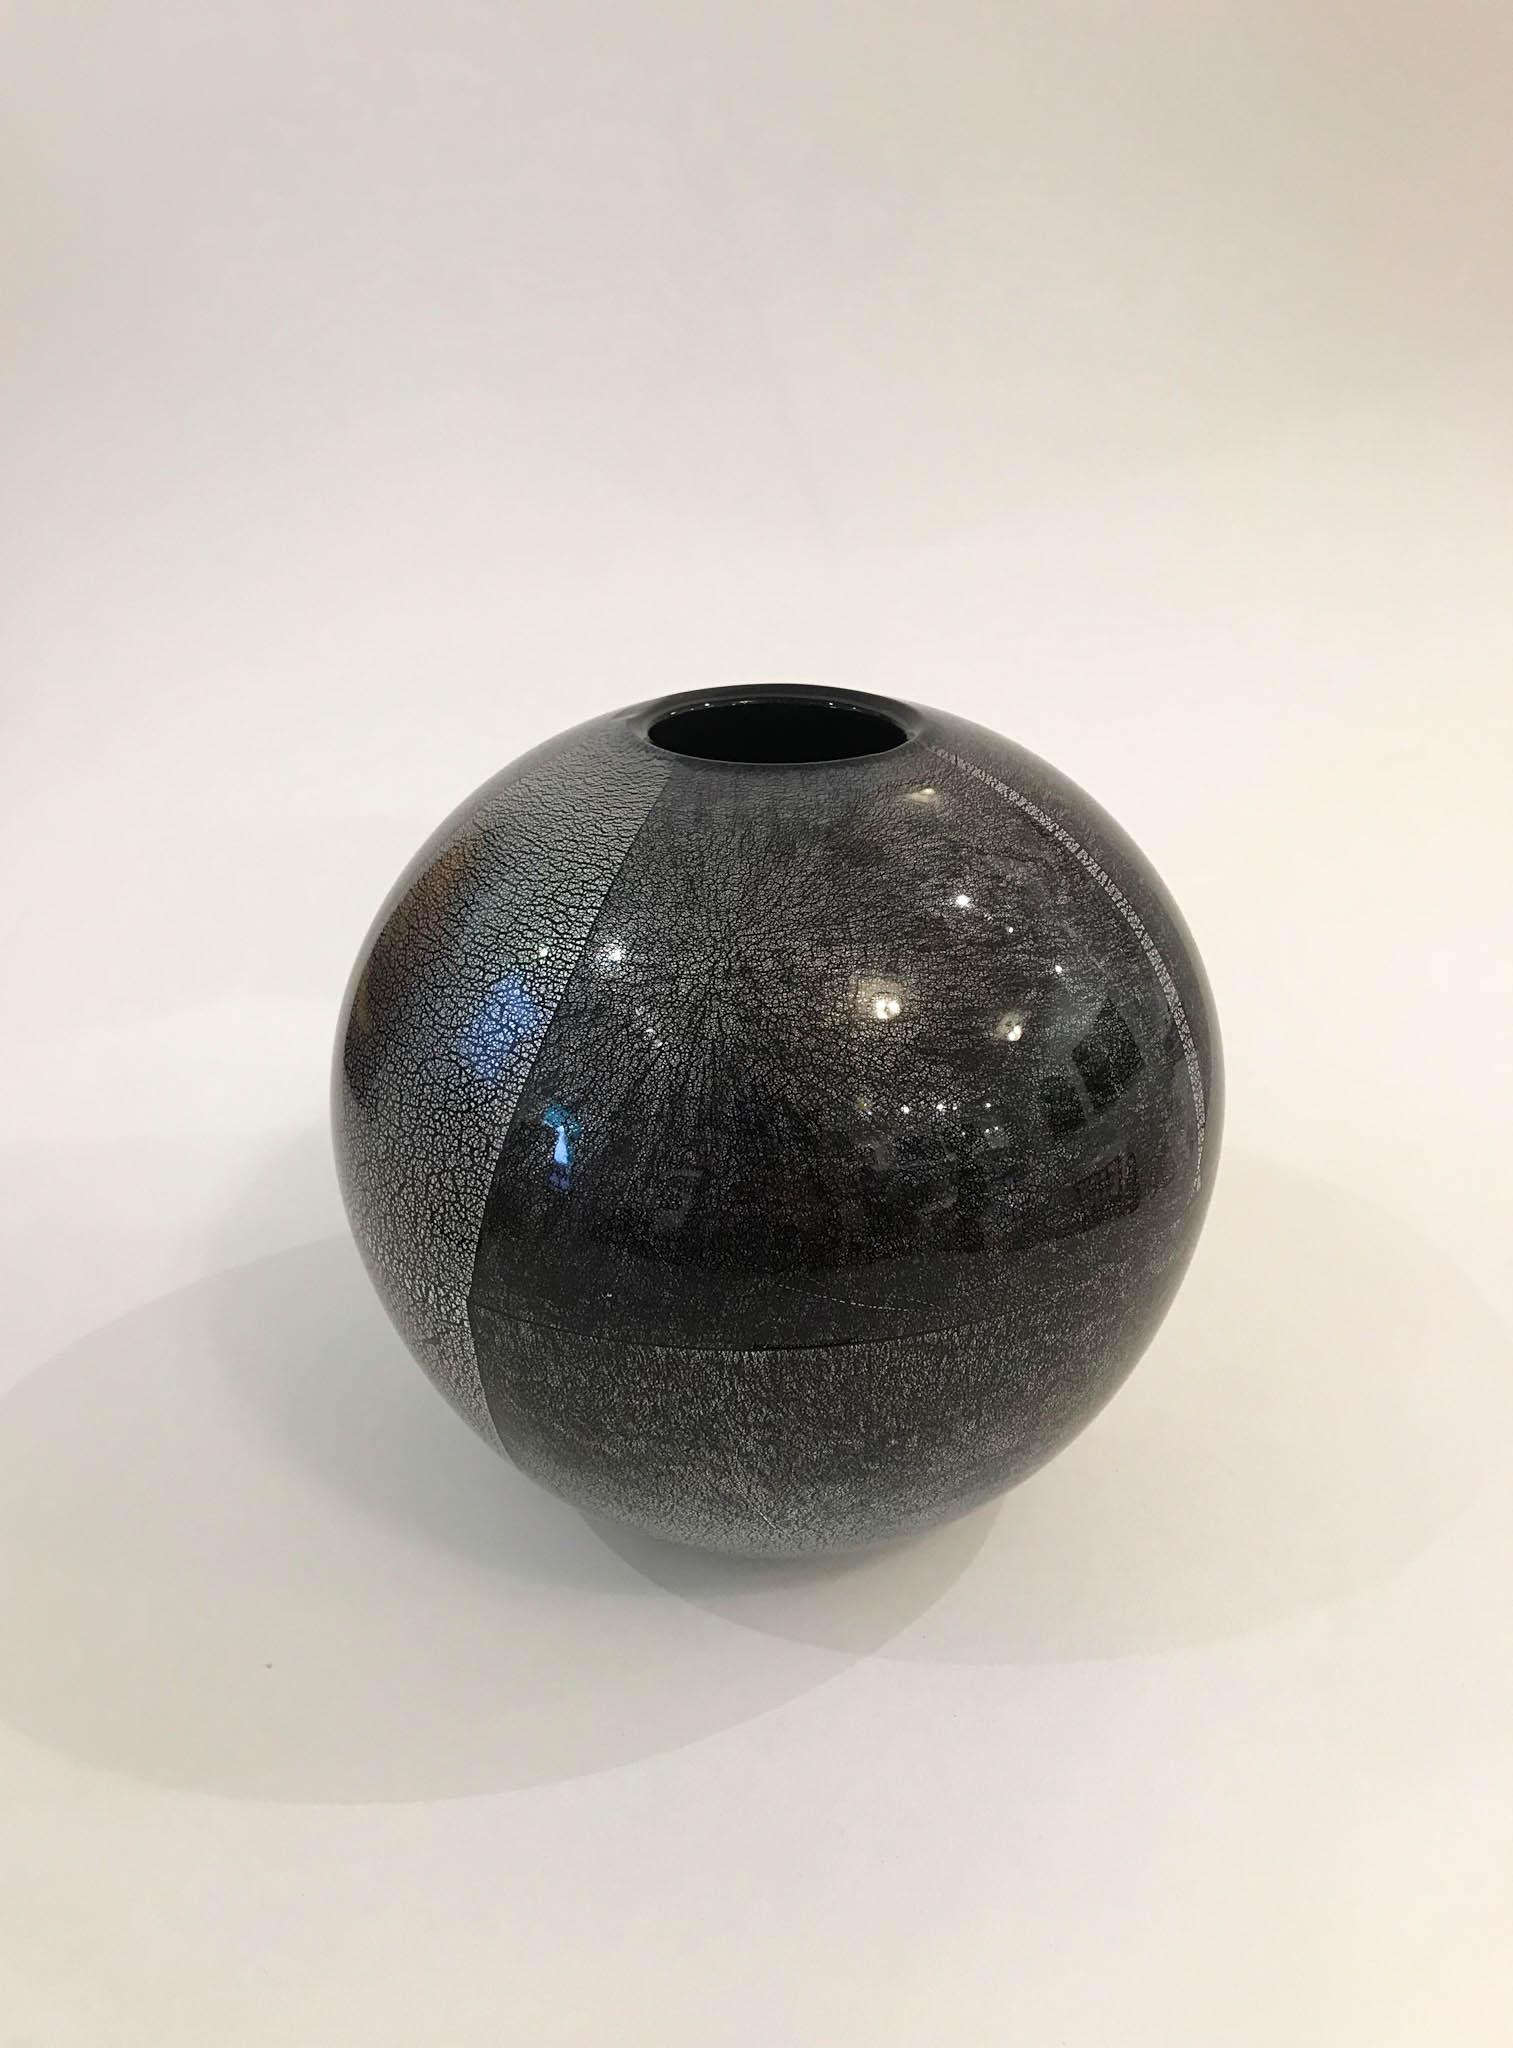 "Orb Vase , hand blown black glass with silver leaf, 6 1/2"" x 6 1/2"" x 6 1/2"", $265"